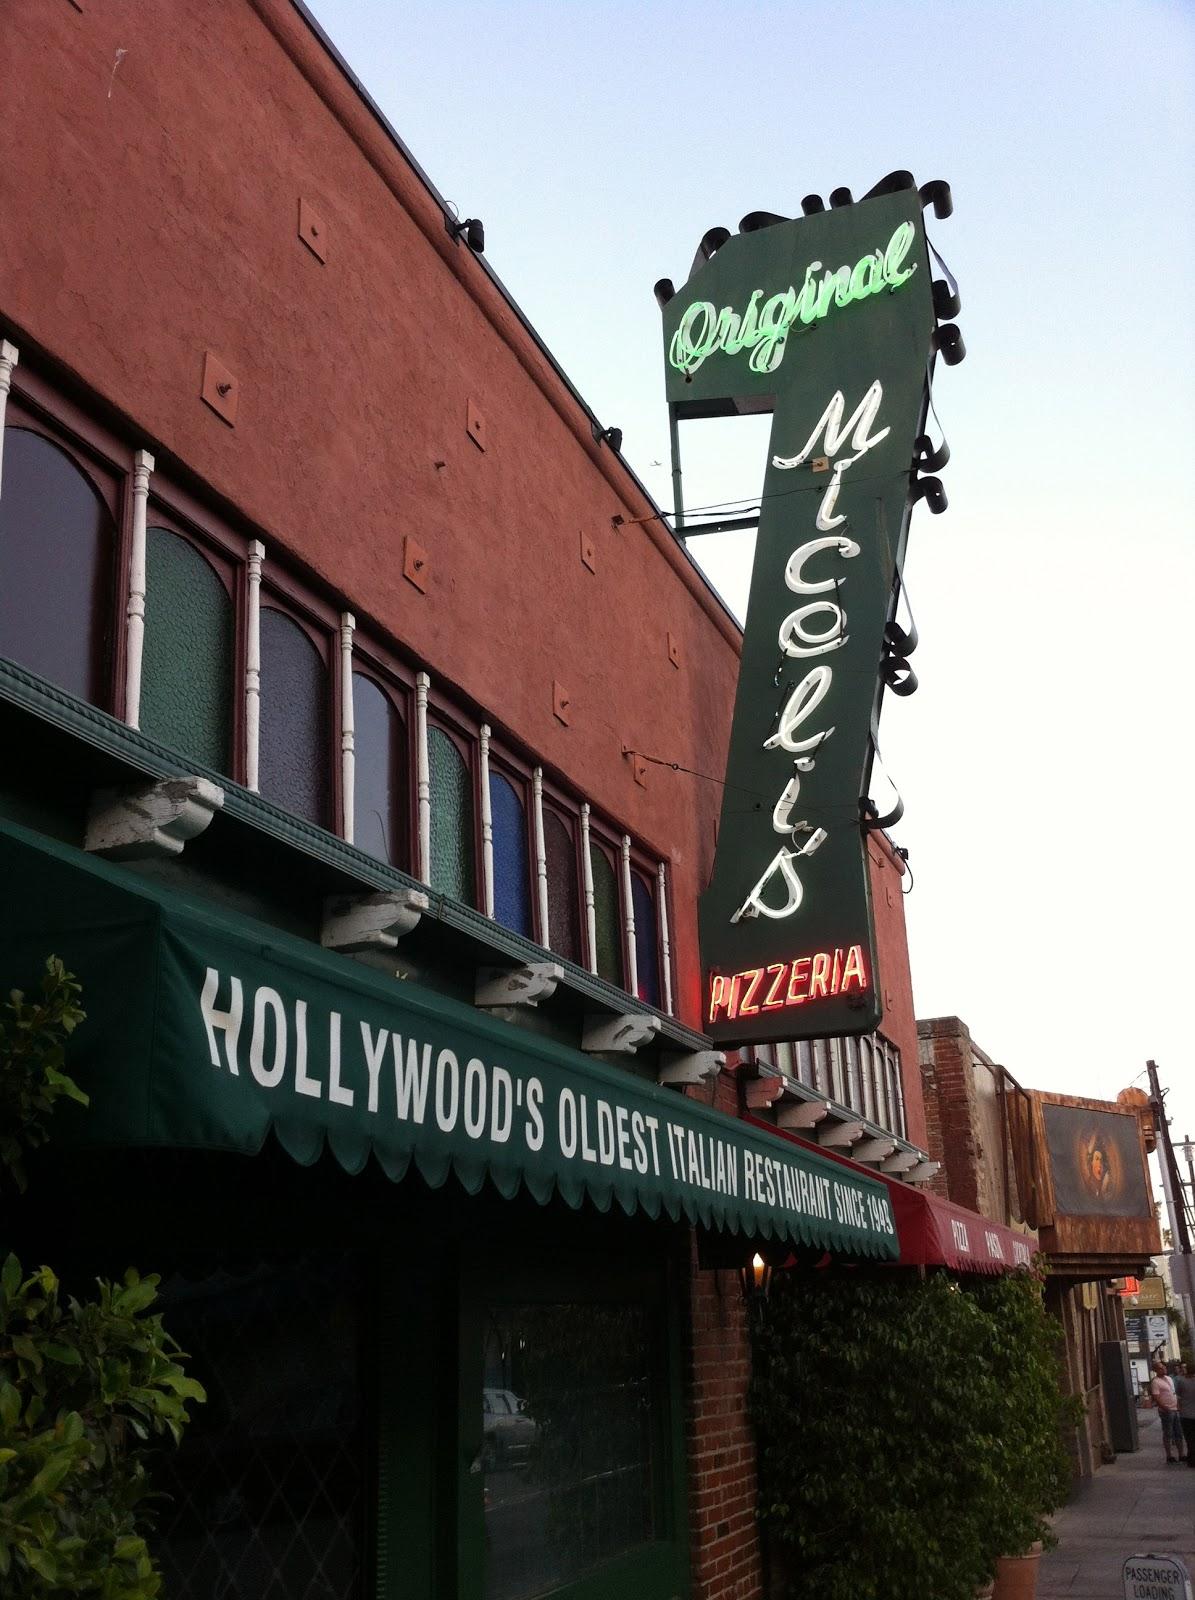 Miceli S Hollywood Oldest Italian Restaurant